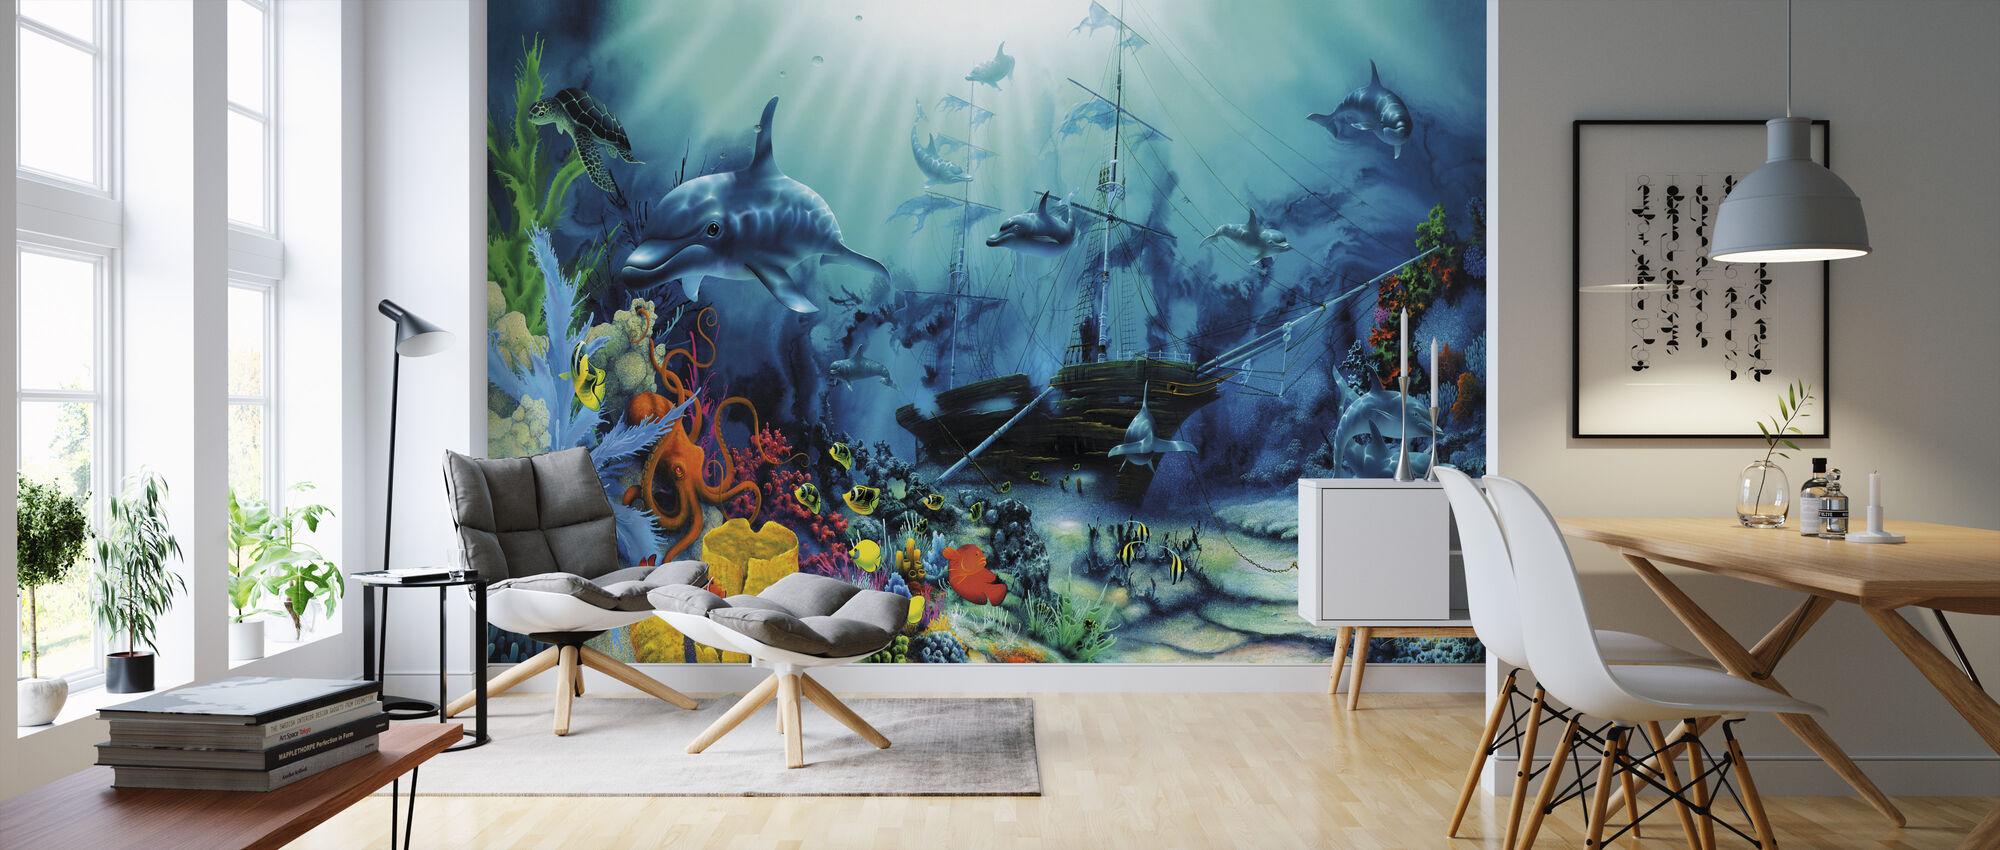 Ocean Treasures - Wallpaper - Living Room